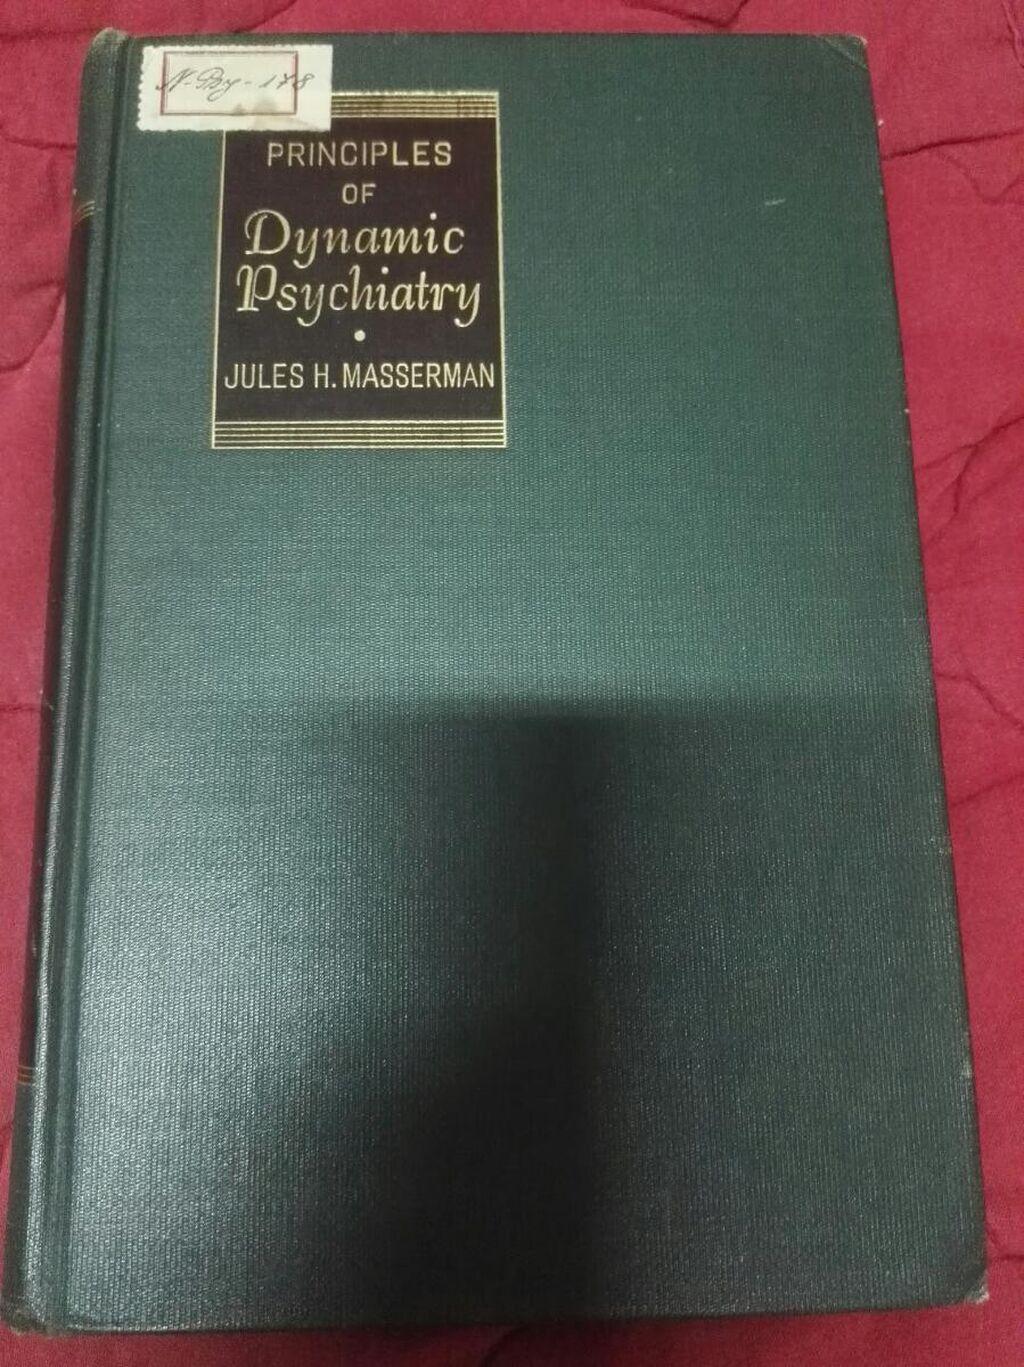 Dynamic Psychiatry J.H.M